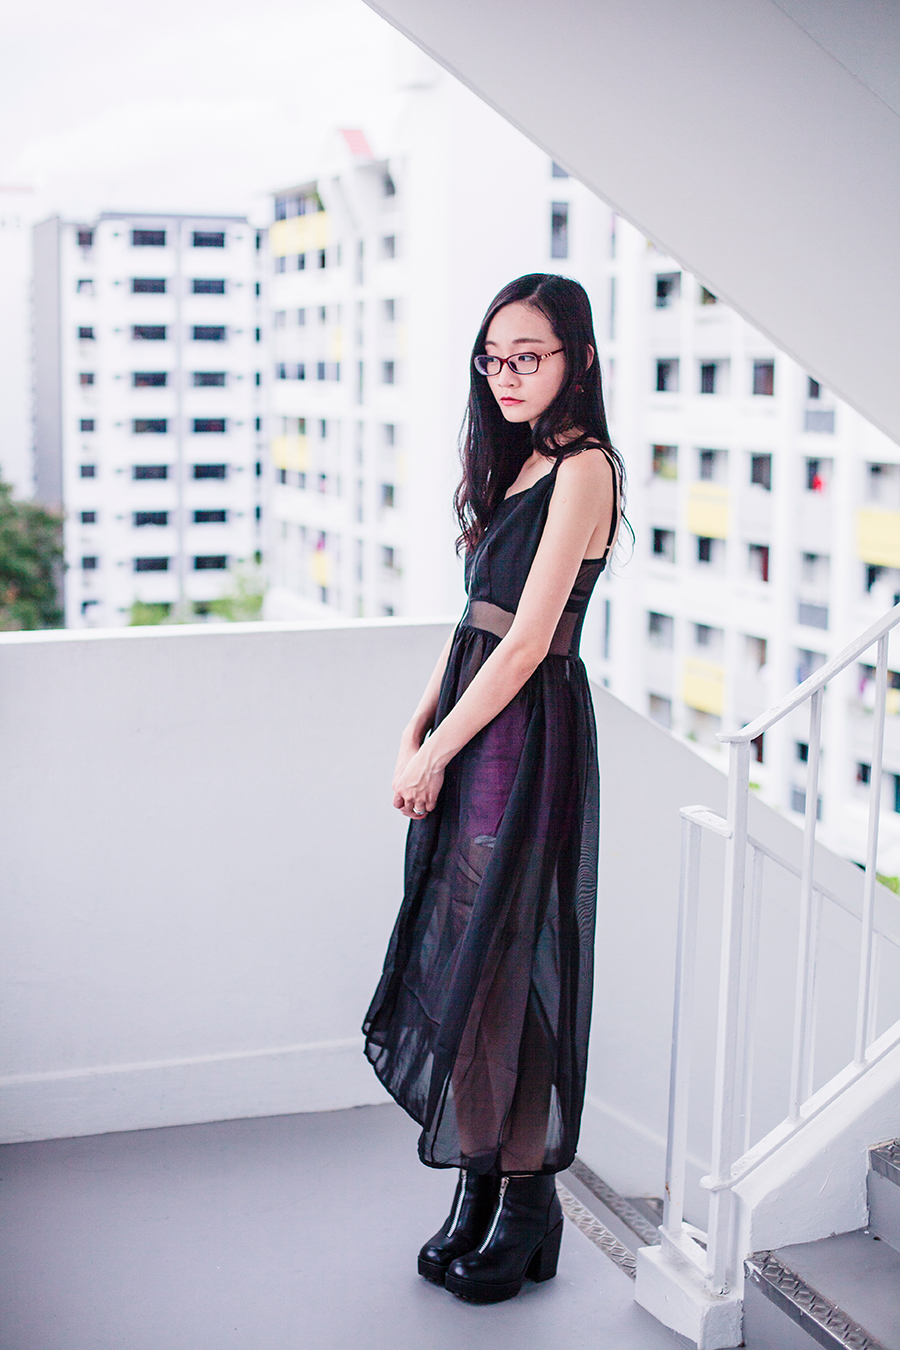 CNDirect sheer overlay dress, Forever 21 orchid pink denim shorts, Rubi platform boots, Topshop lace choker, Firmoo red glasses.